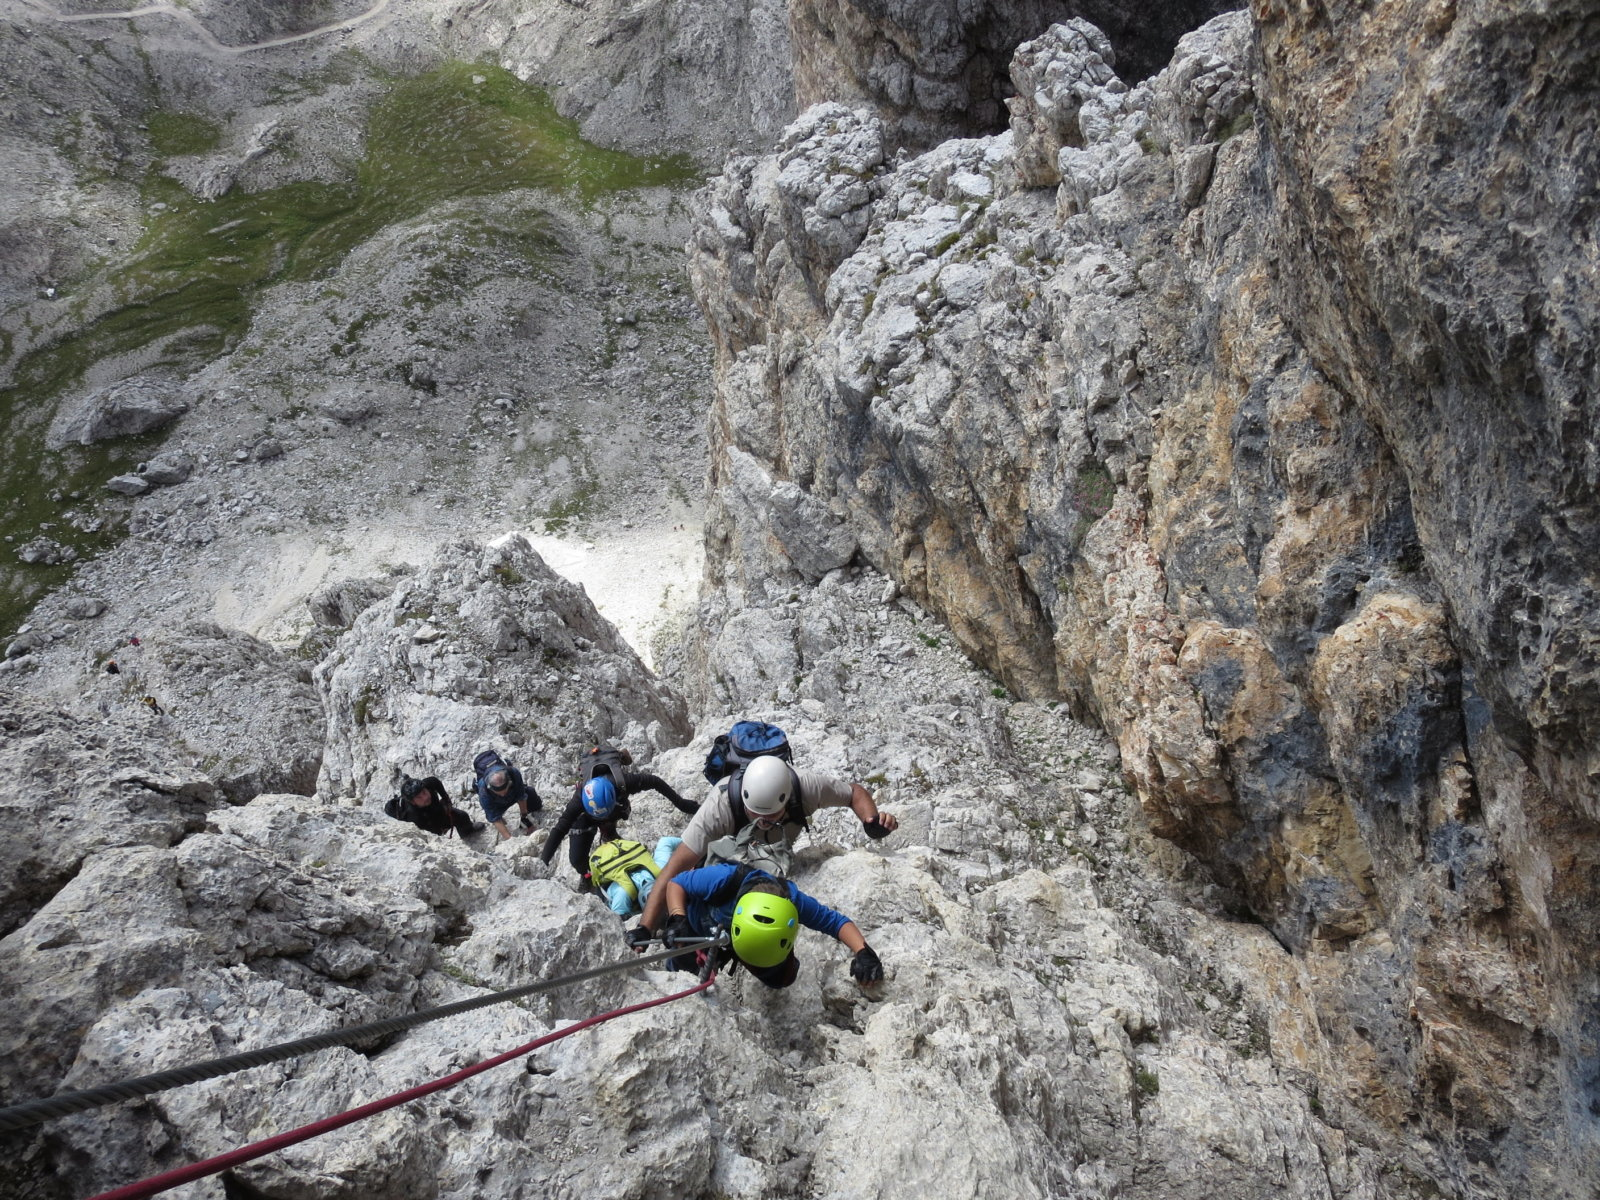 Vallon Klettersteig : Klettersteig beschreibung lichtenfelser weg